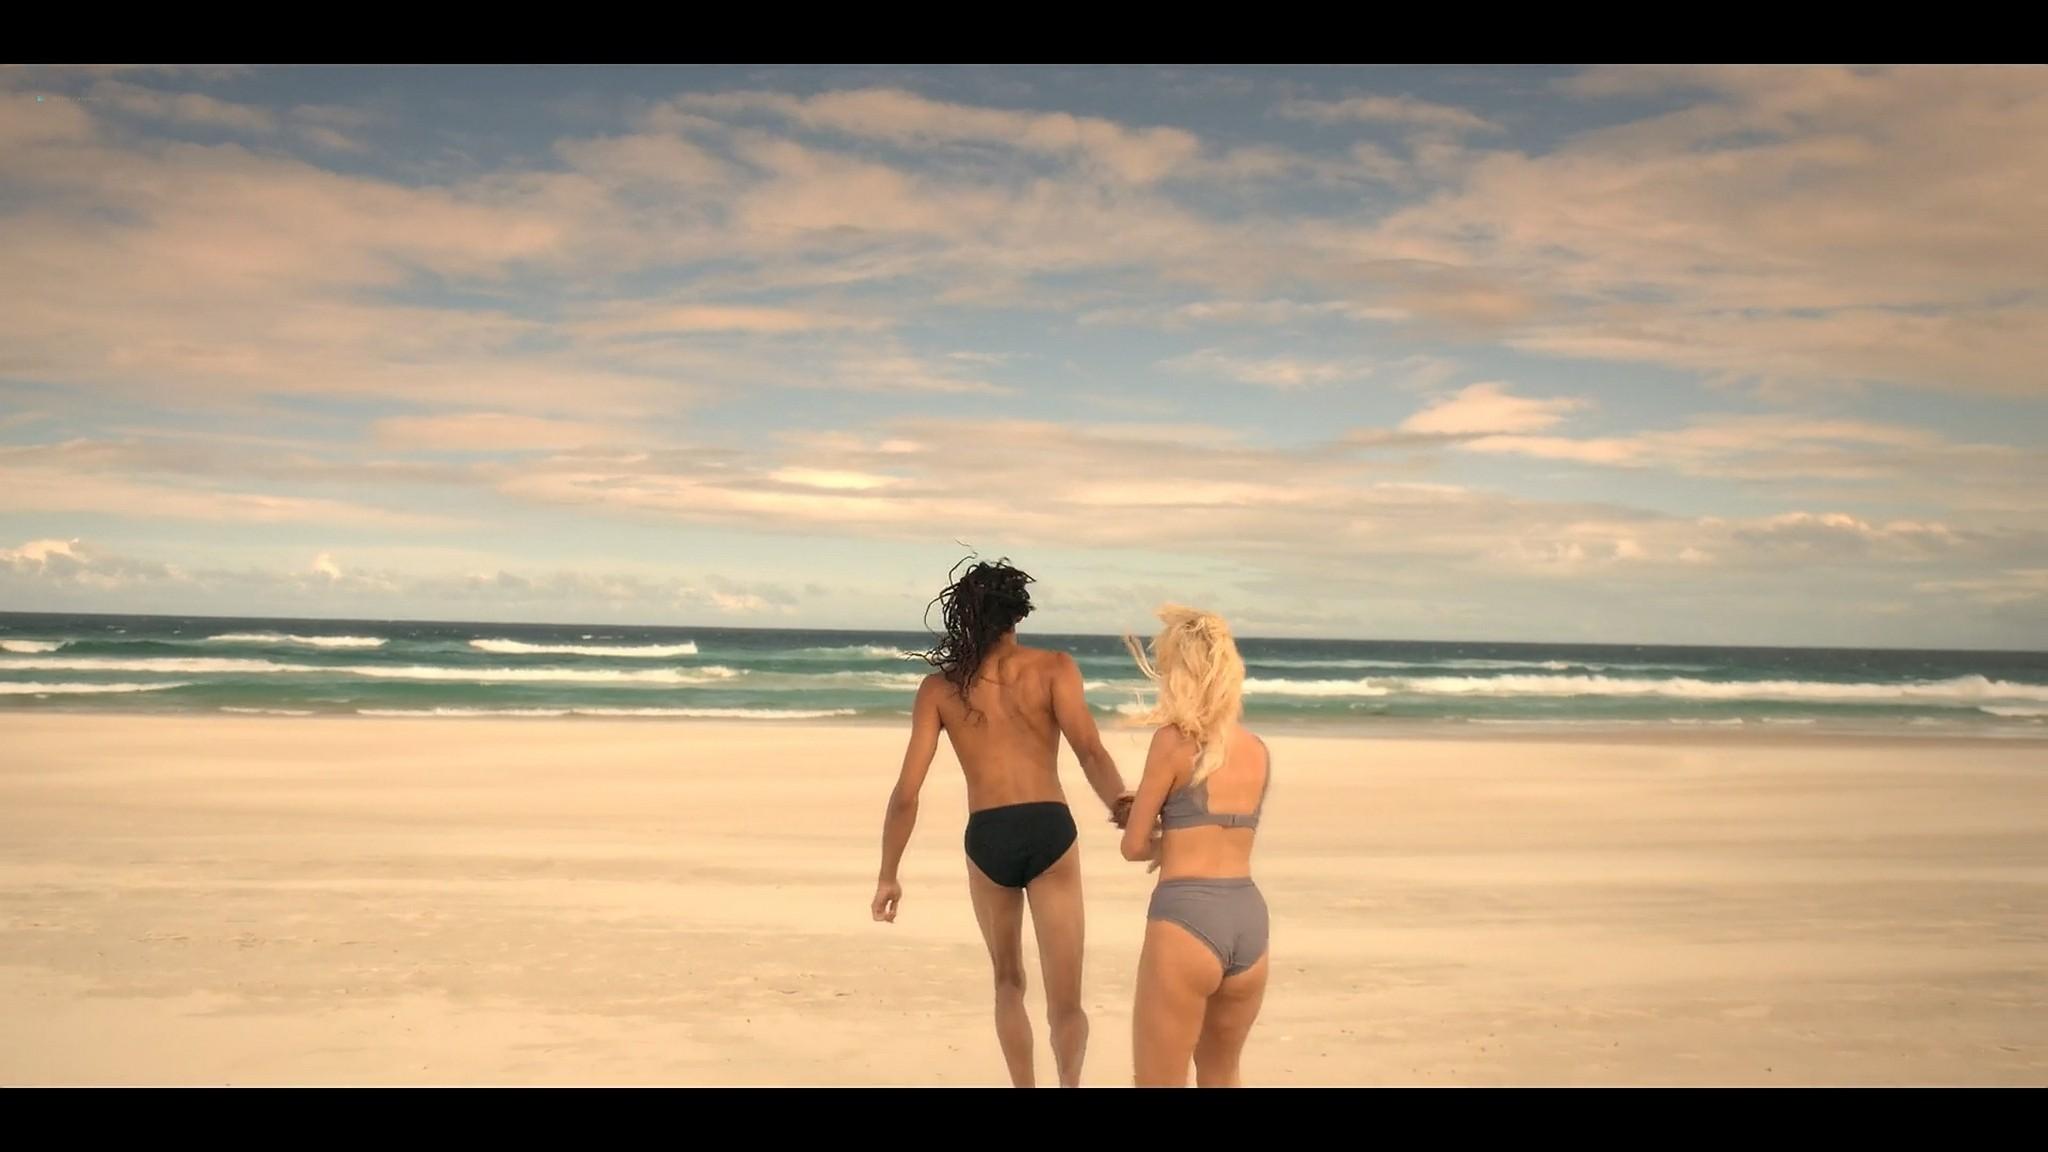 BeBe Bettencourt sexy Sophie Wilde Priscilla Doueihy hot lesbian sex Eden AU 2021 s1e4 8 1080p Web